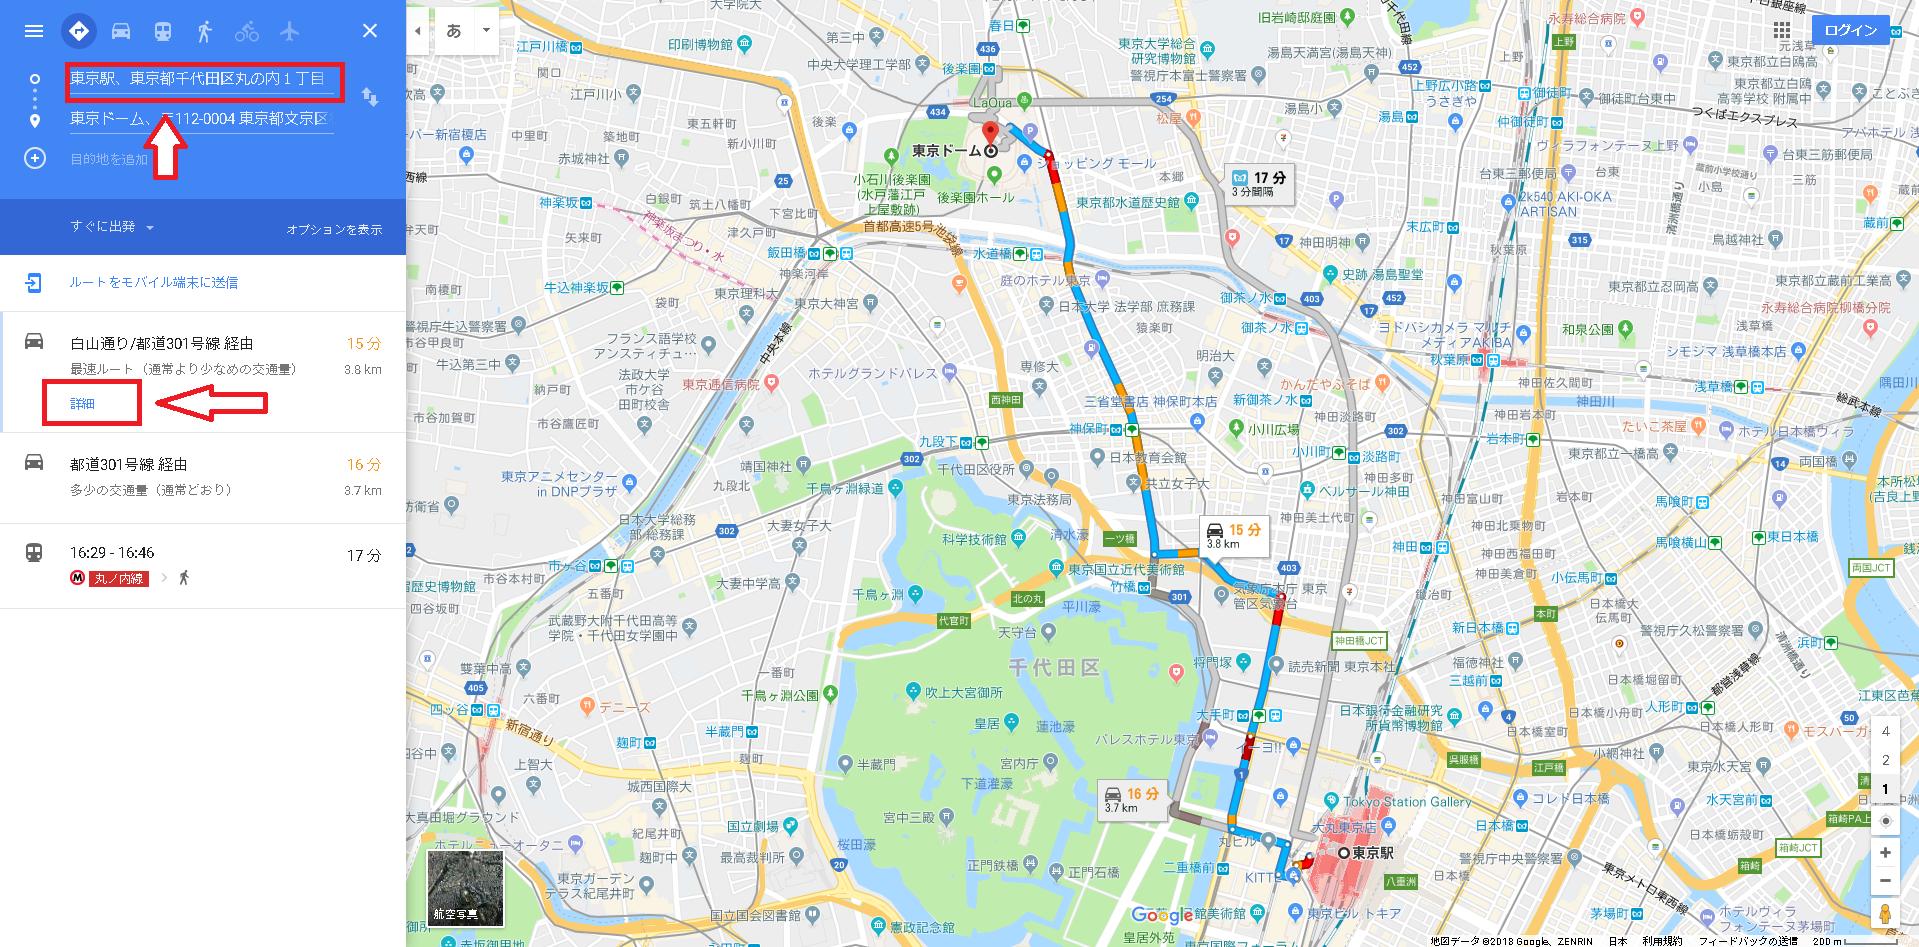 Googleマップでの地図の印刷方法a4サイズで大きく印刷スマホ